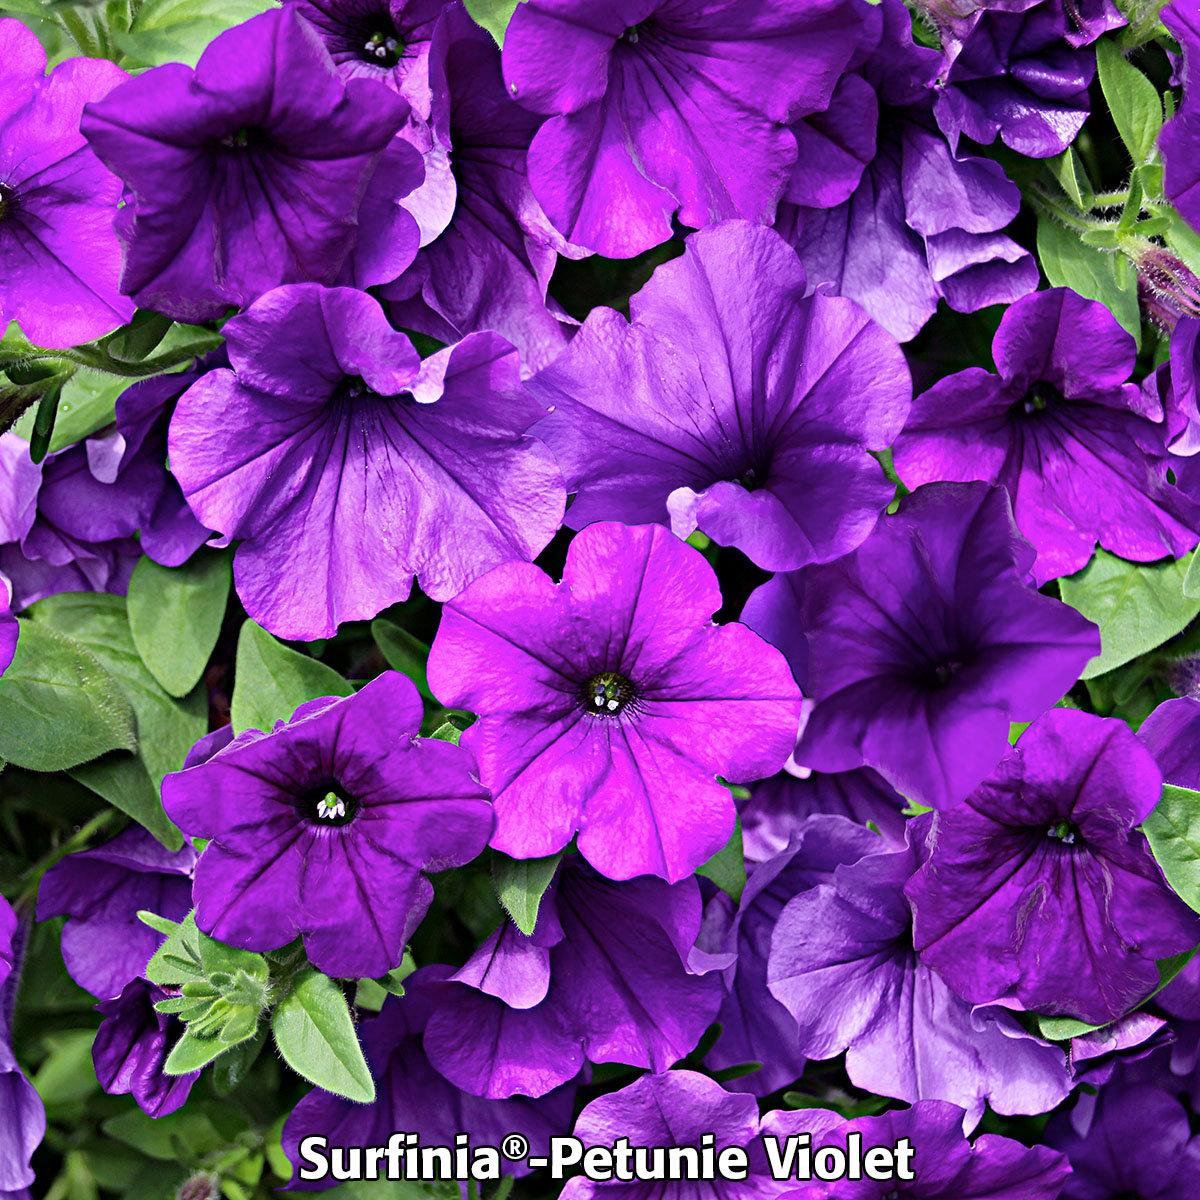 Sommerblumen-Sortiment Petunien | #2